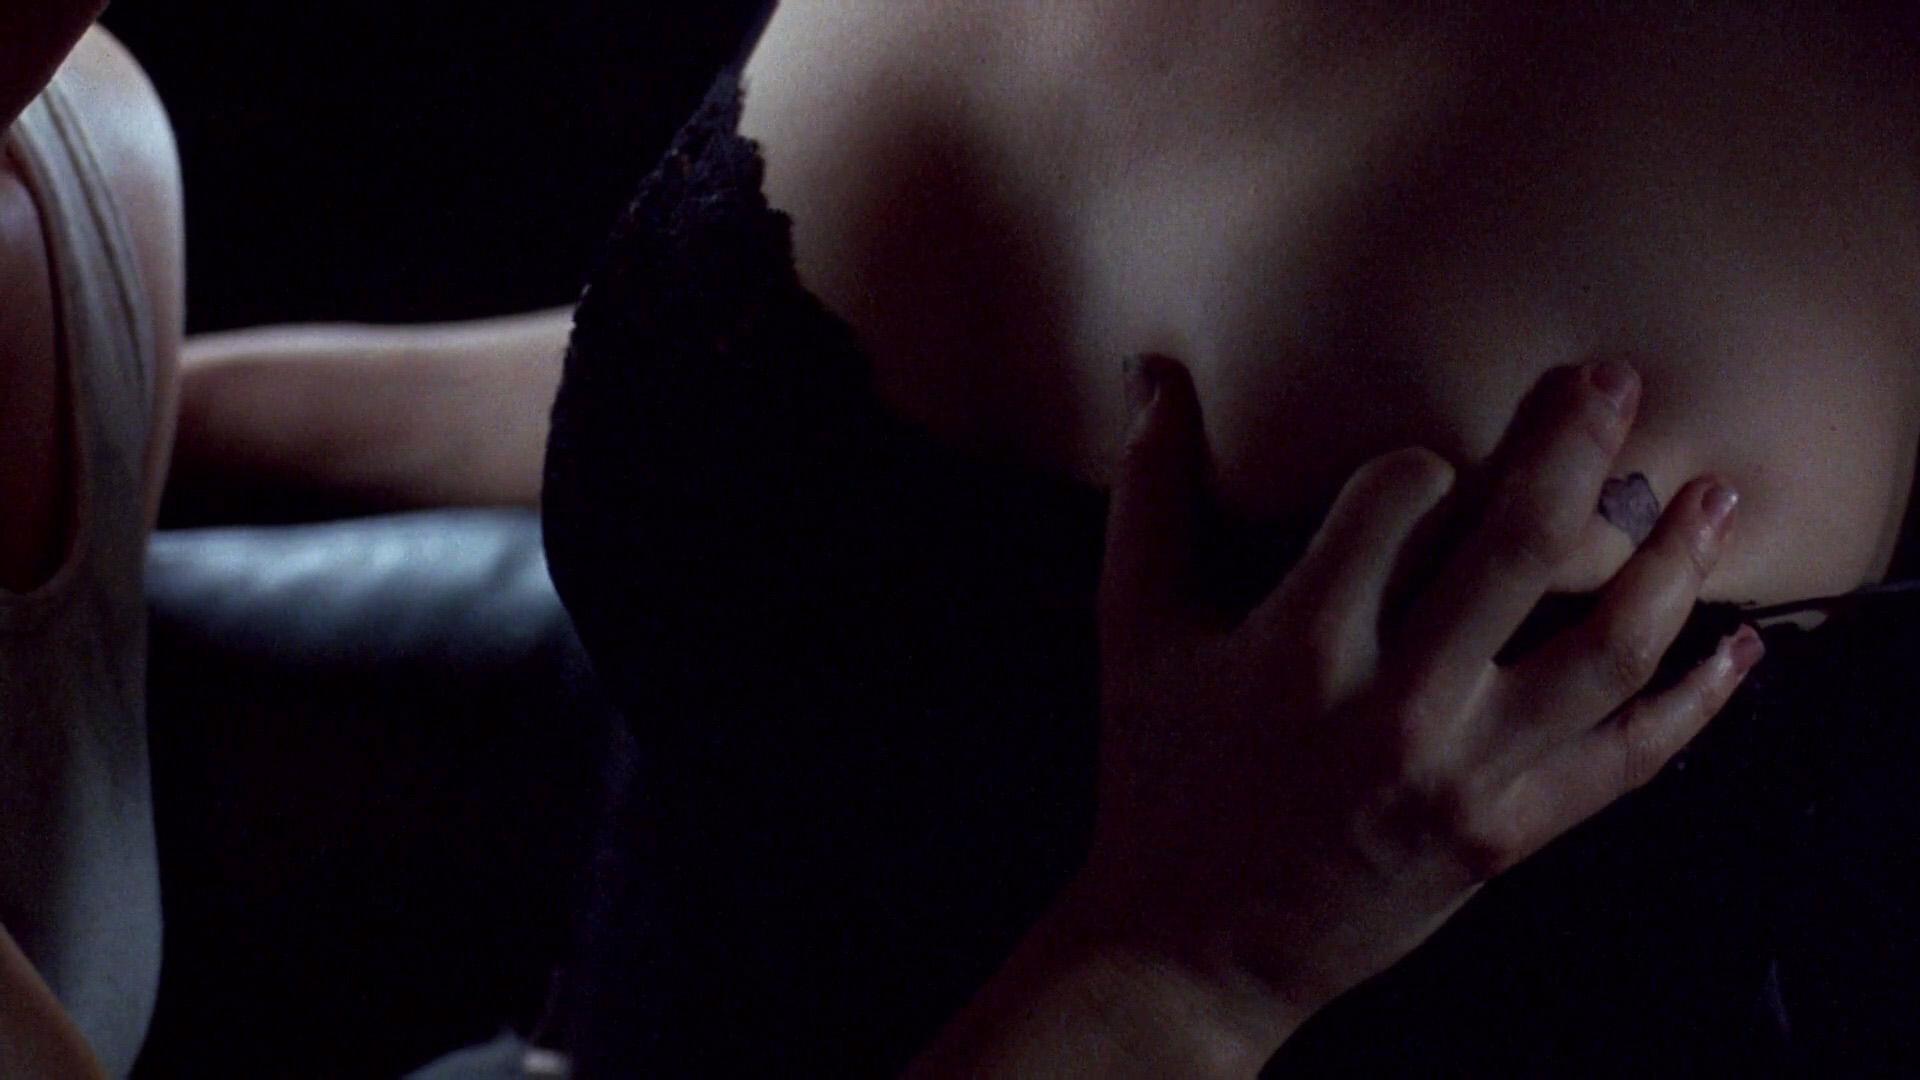 Watch Jennifer tilly nude sex scene fast sofa movie video